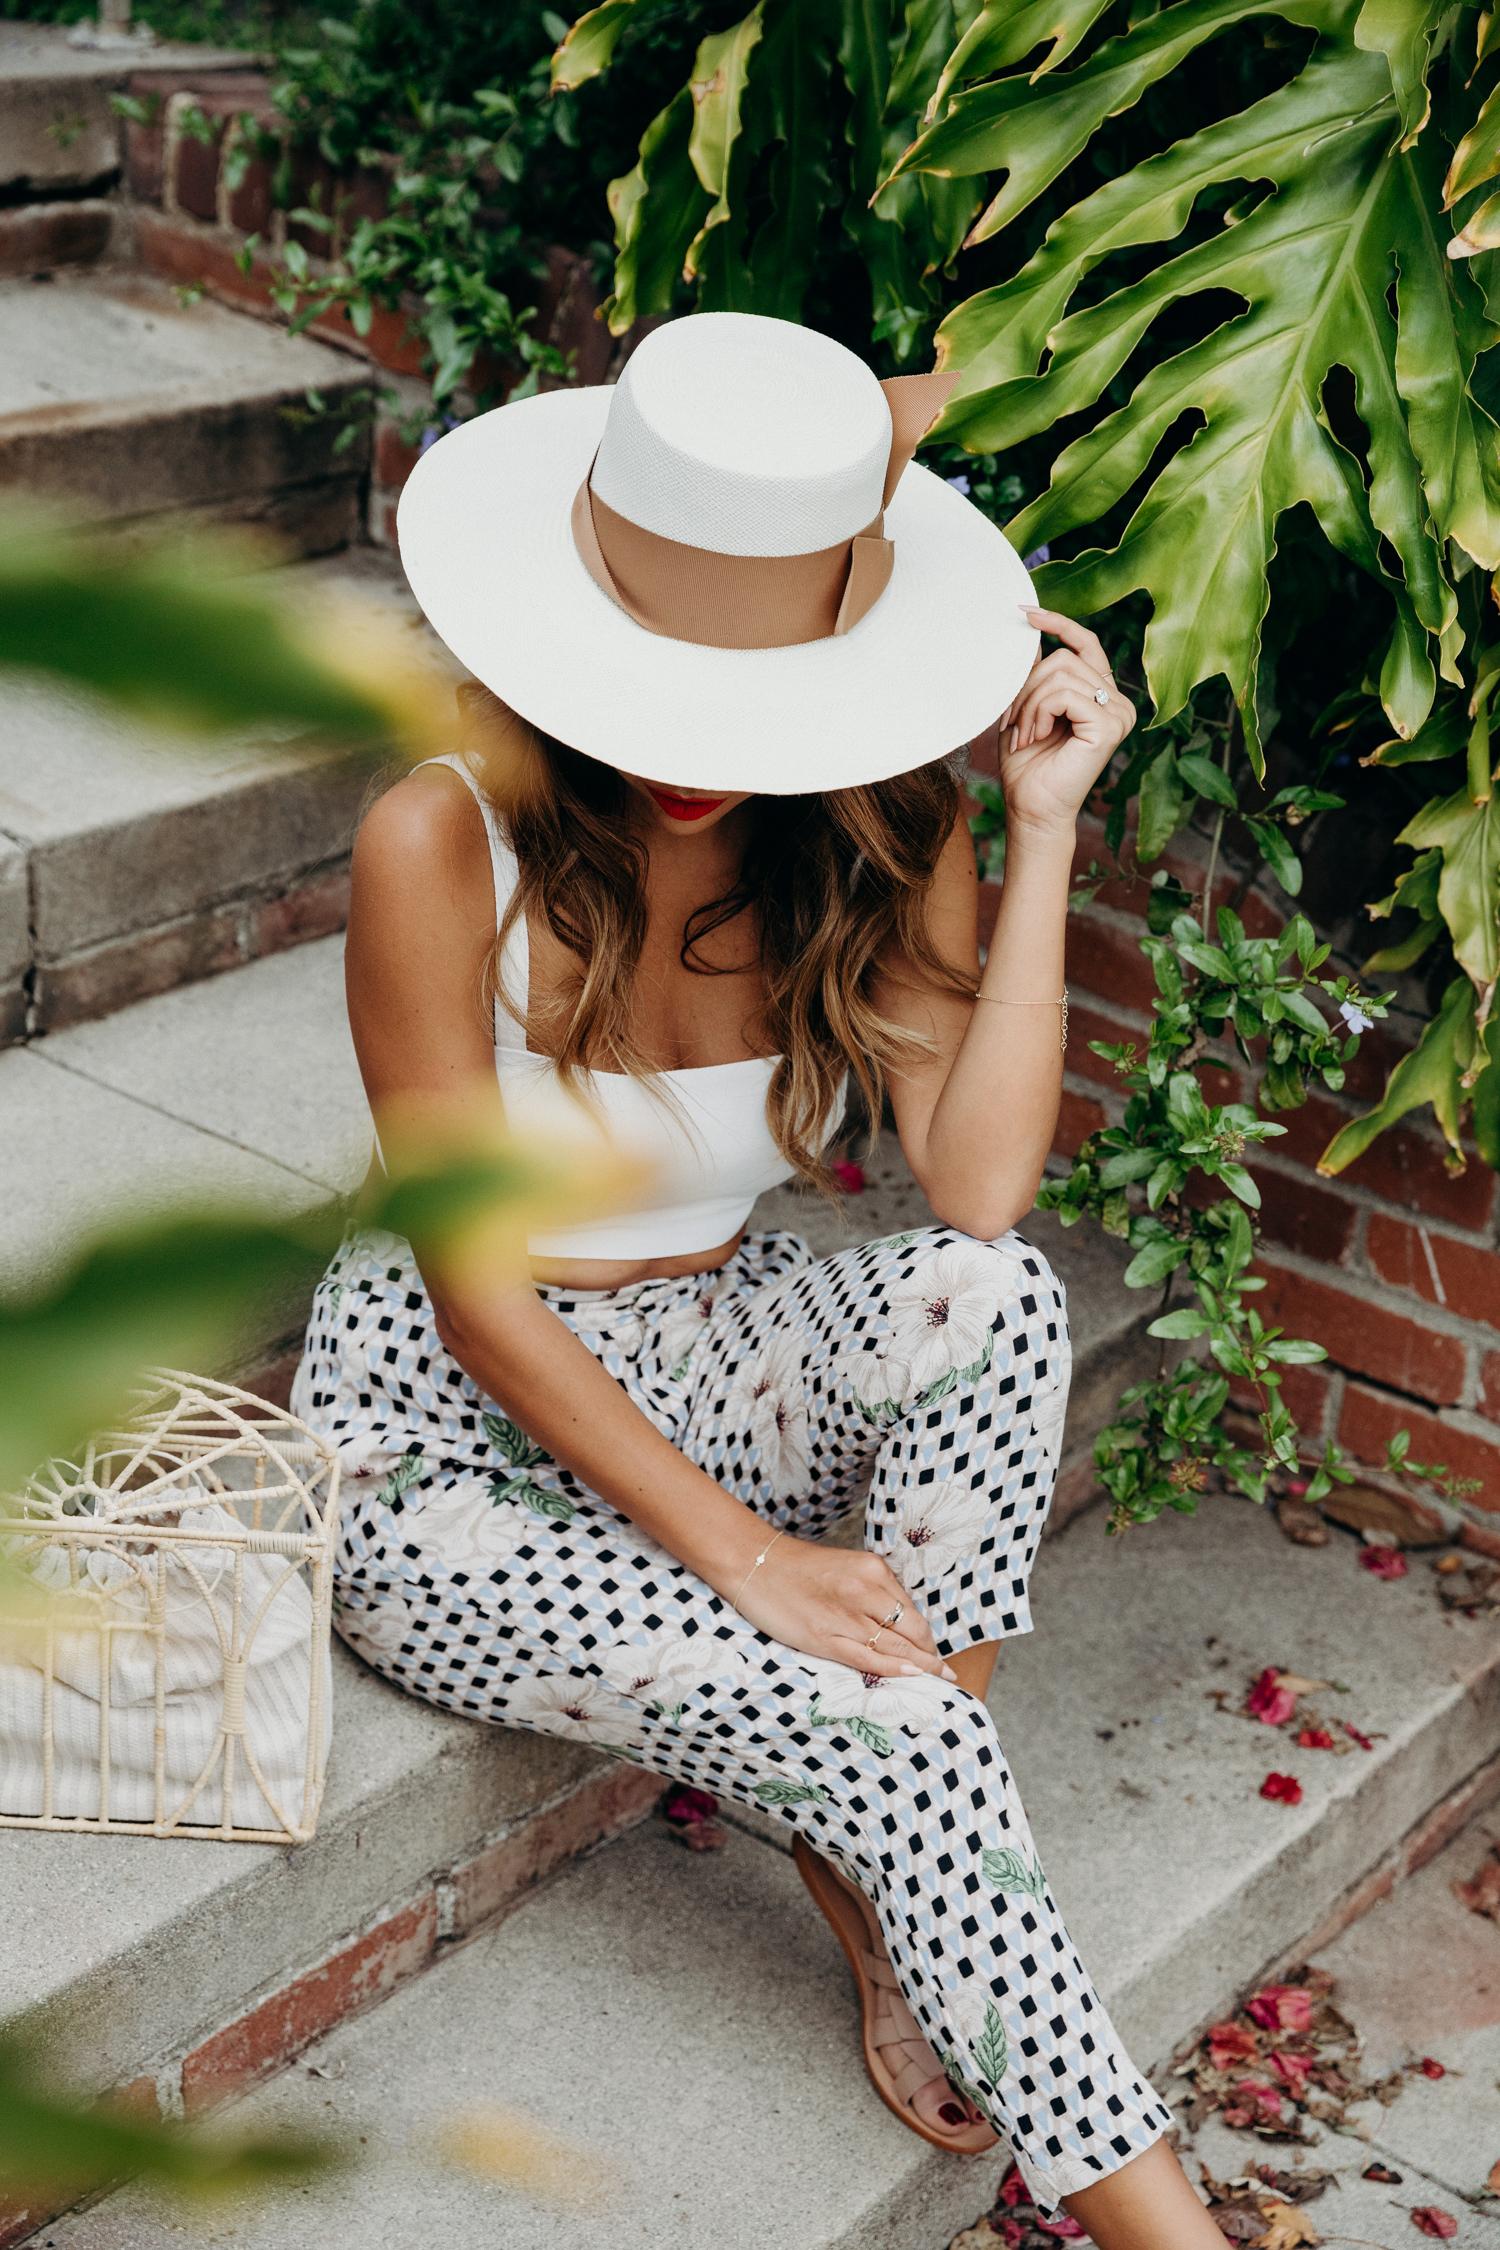 Honeymoon outfit ideas - Belize + Mexico - Sensi Panama Hat